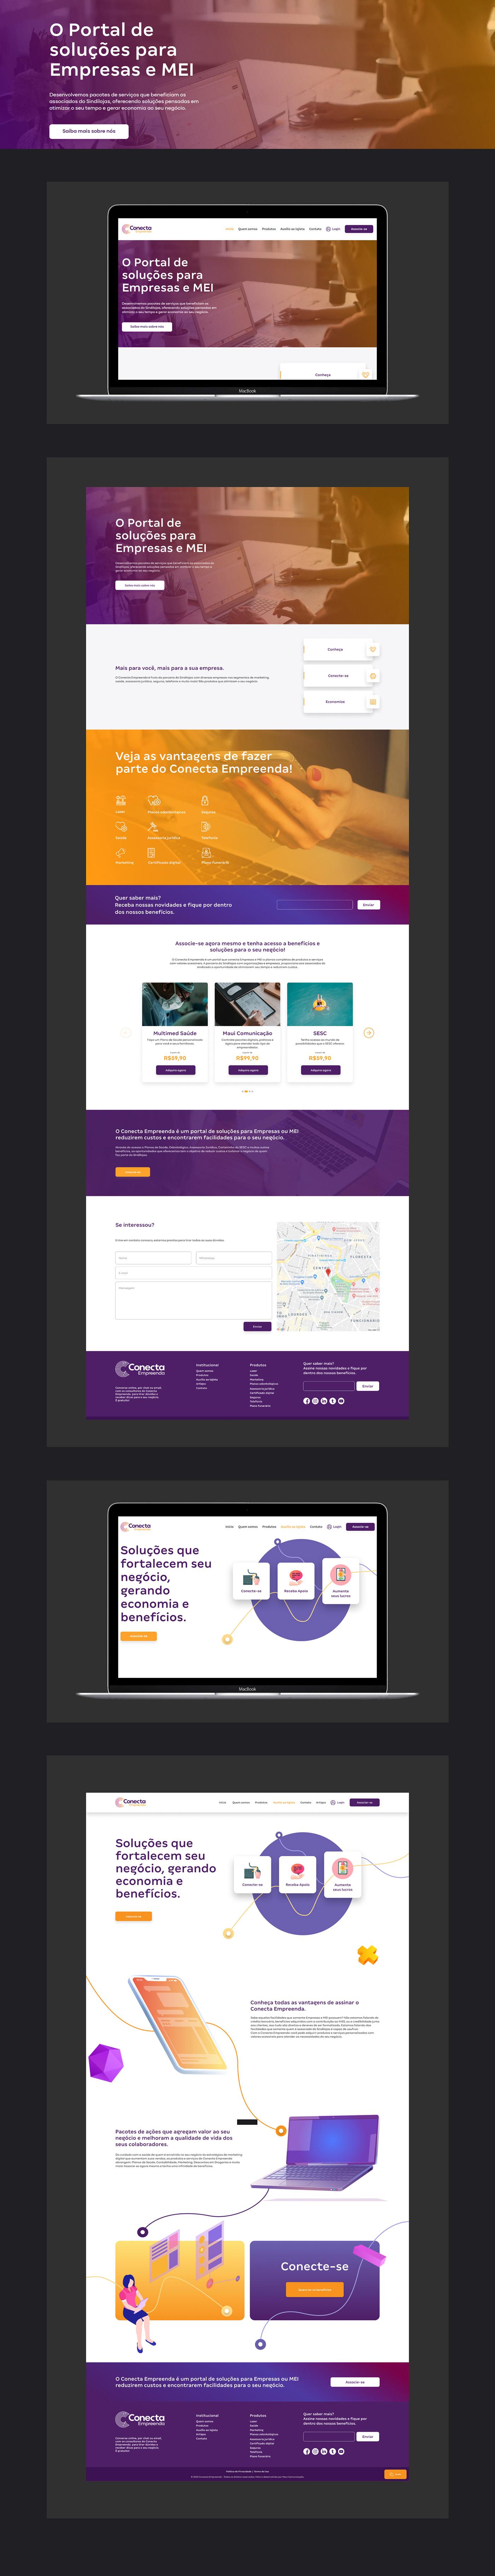 identidade visual Website